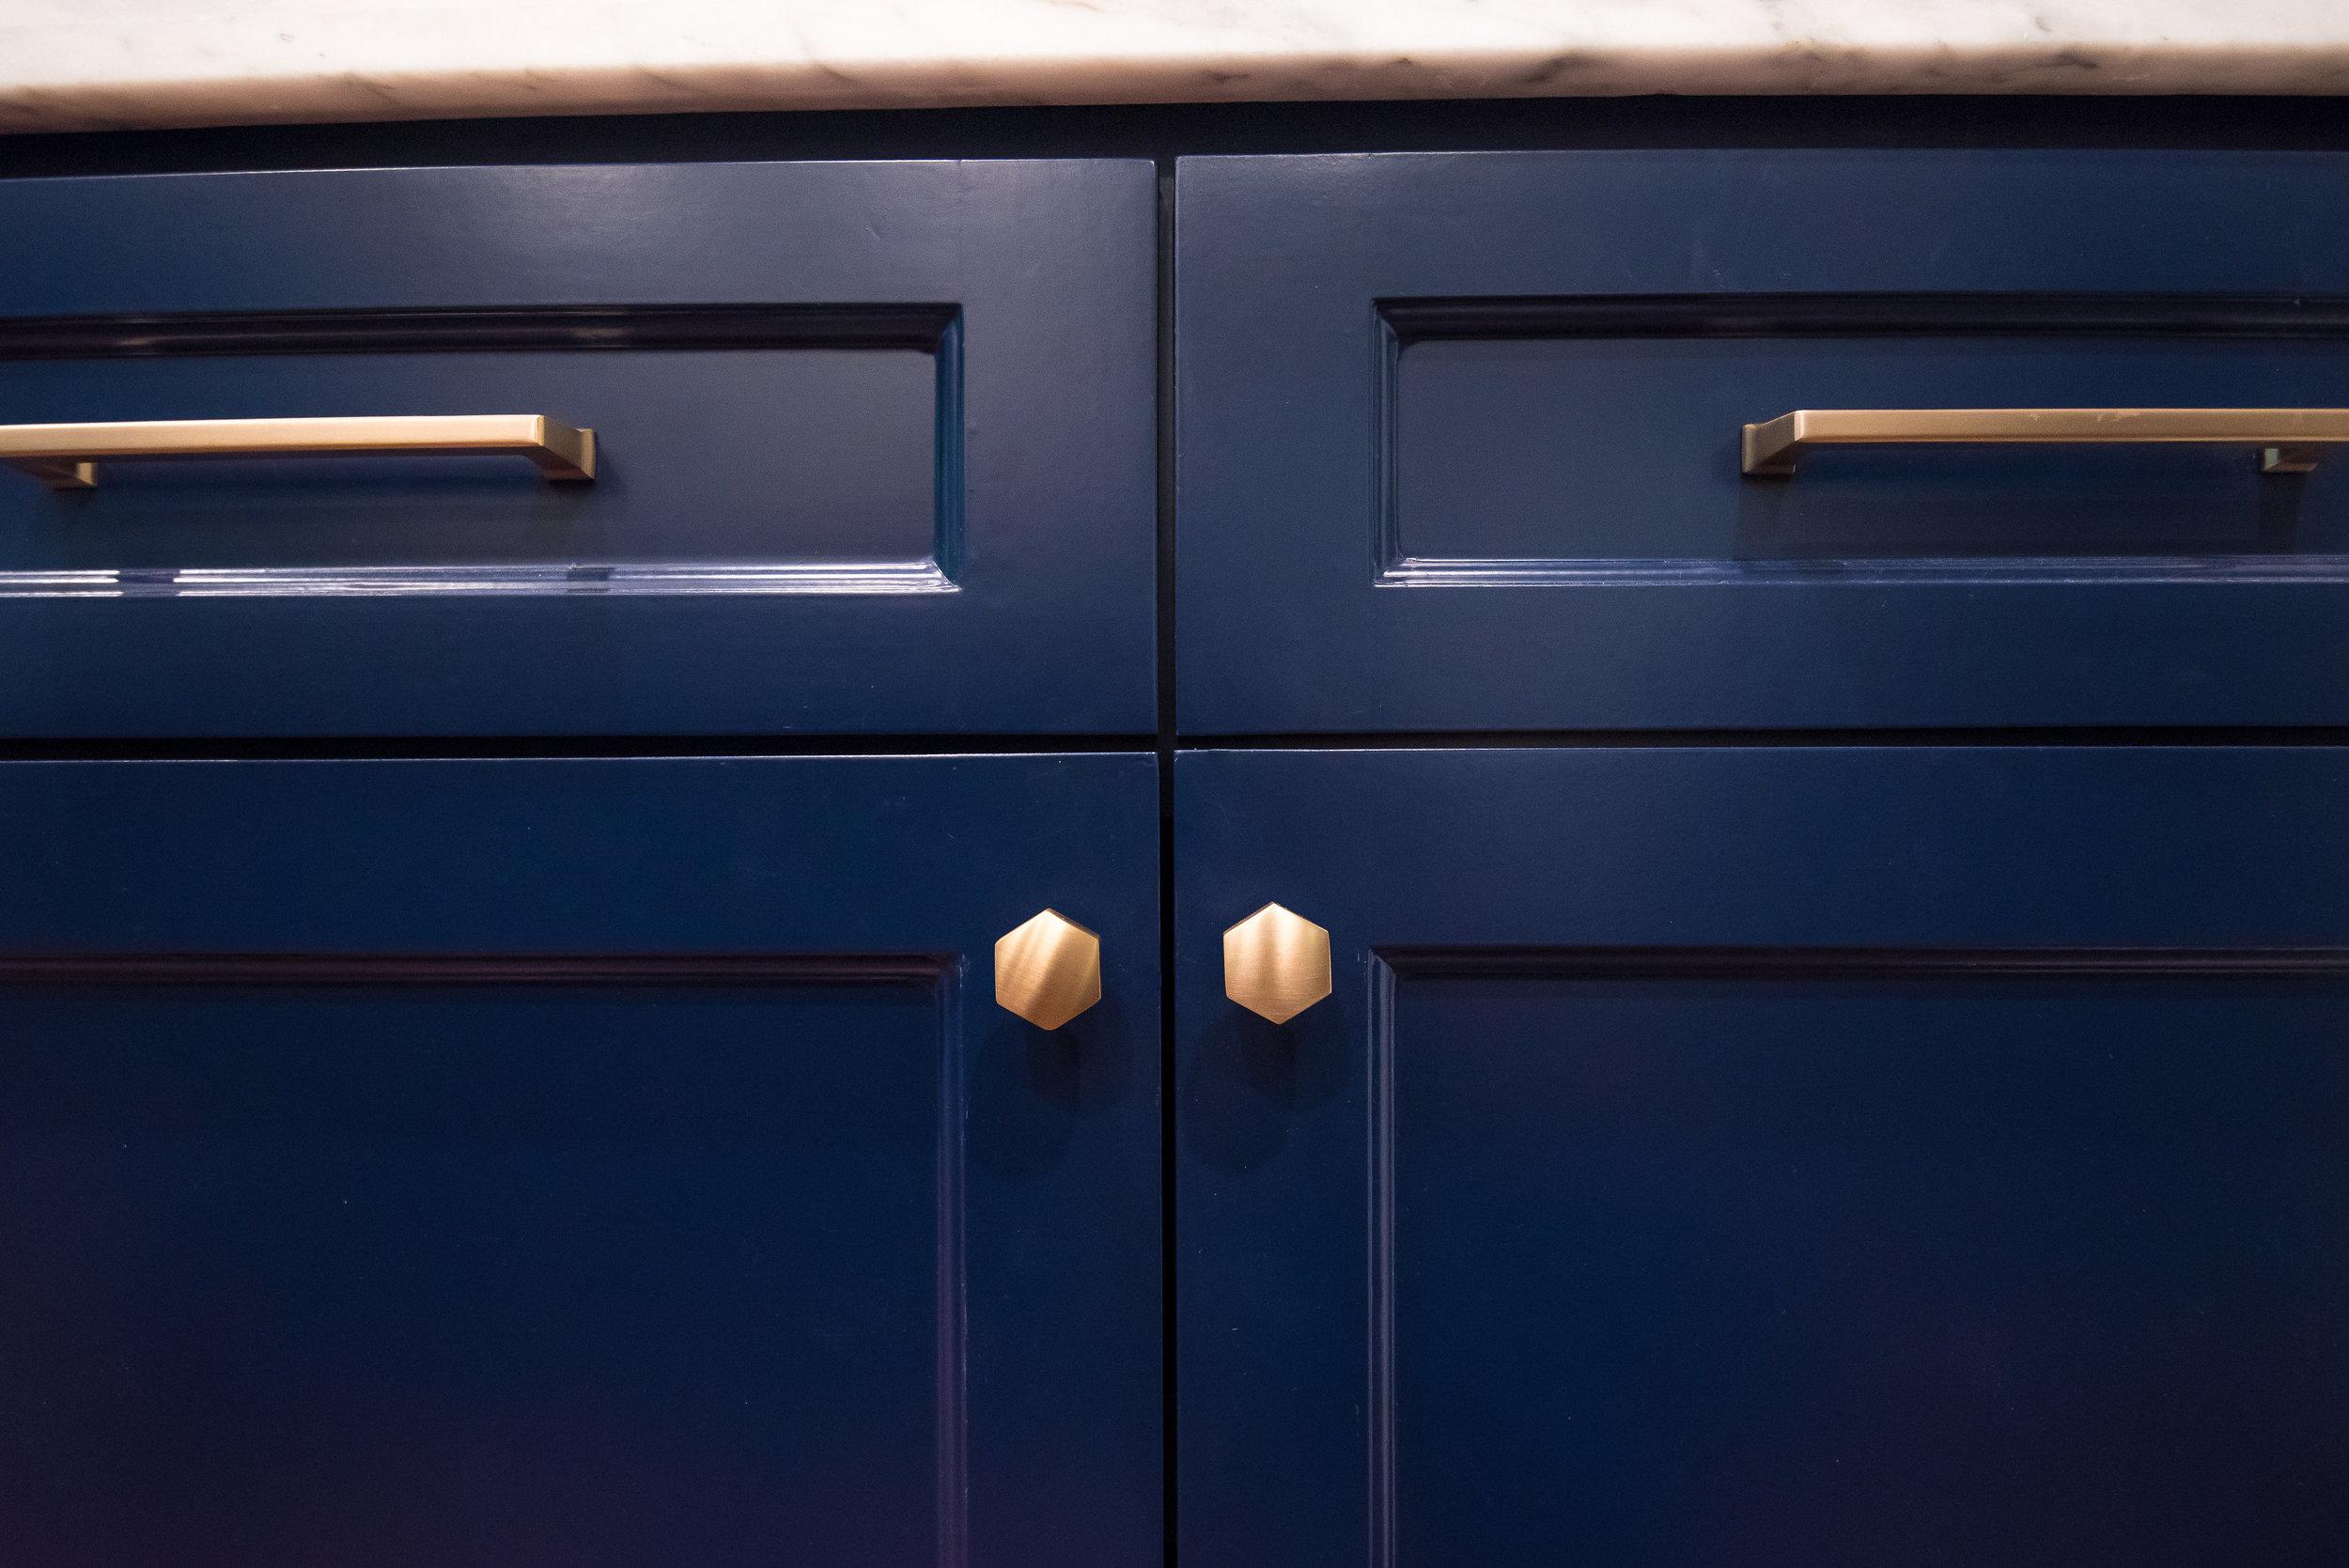 Navy cabinets with brass hardware - Carla Aston Designer, Lauren Giles Photographer